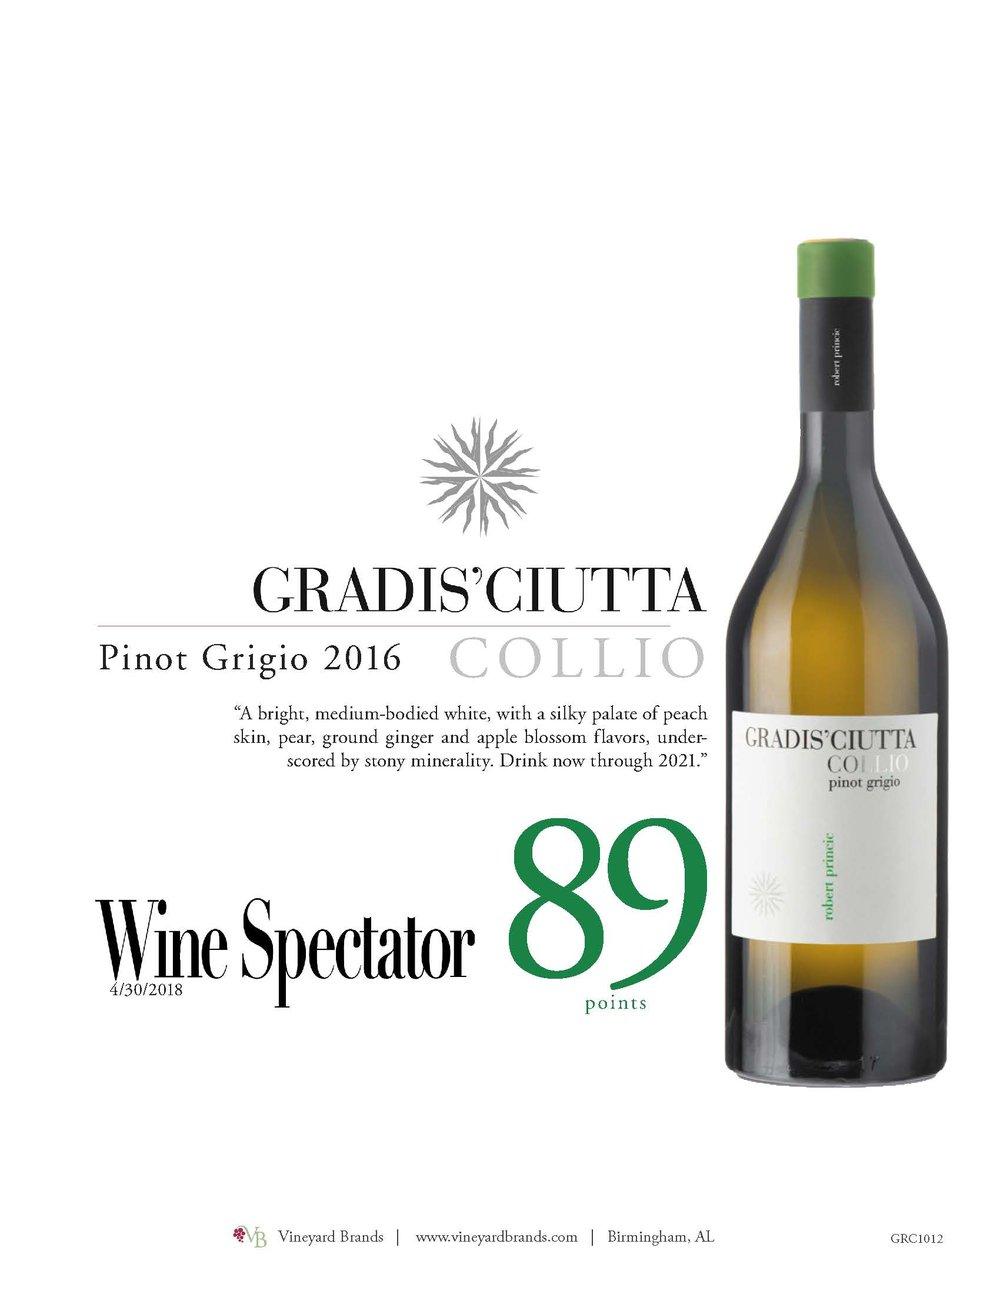 Gradis'ciutta Pinot Grigio 2016.jpg